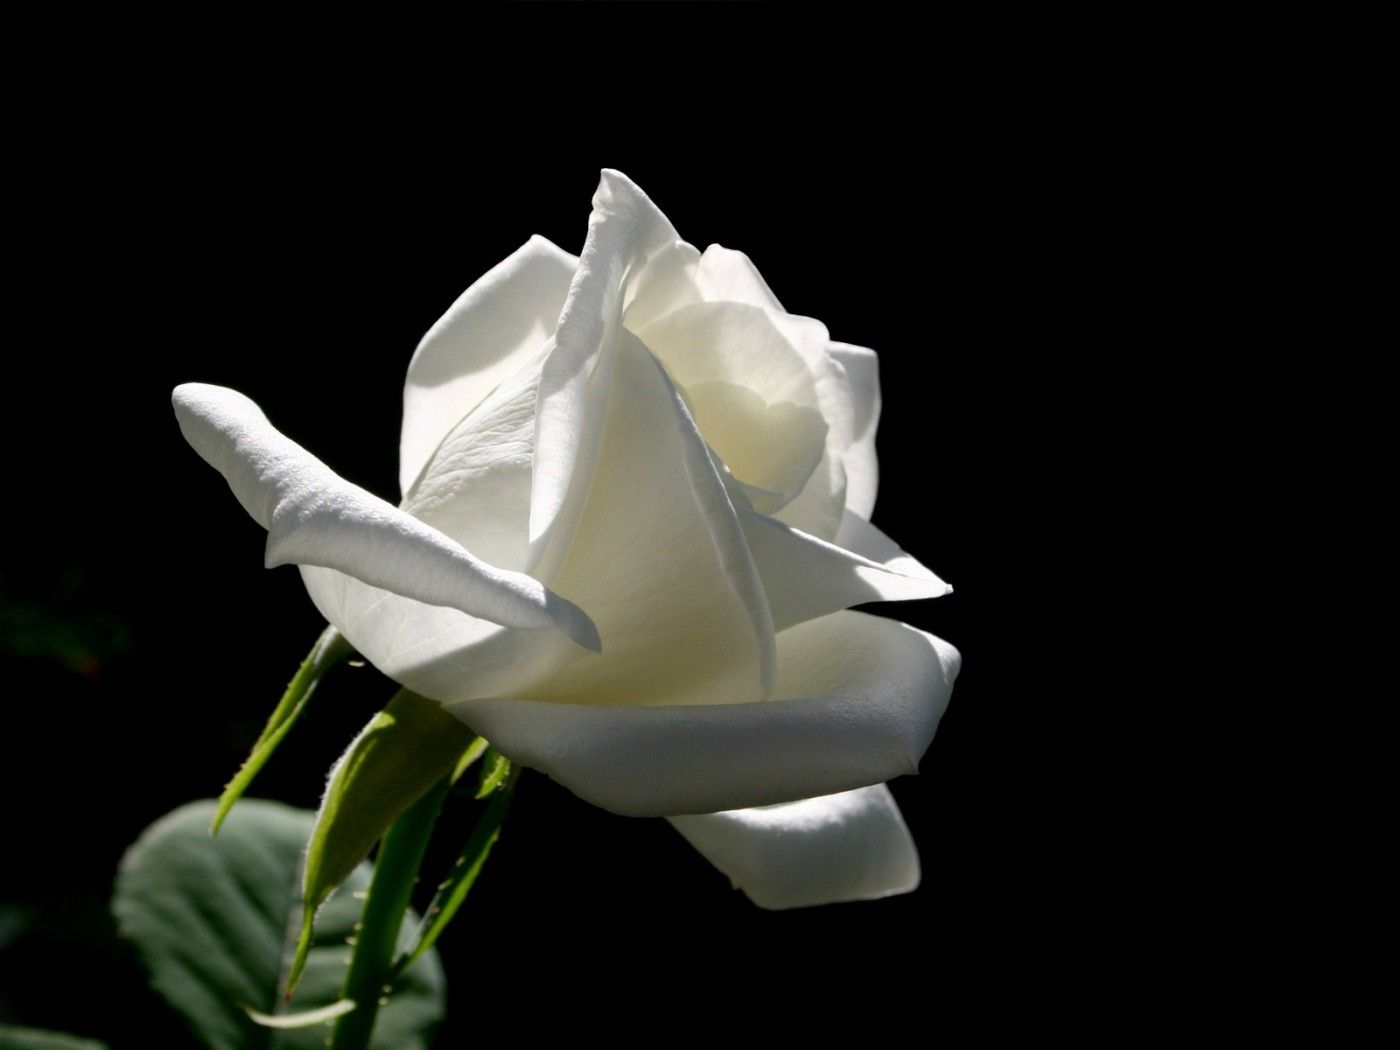 White Rose The White Rose On A Black Background Black Flowers